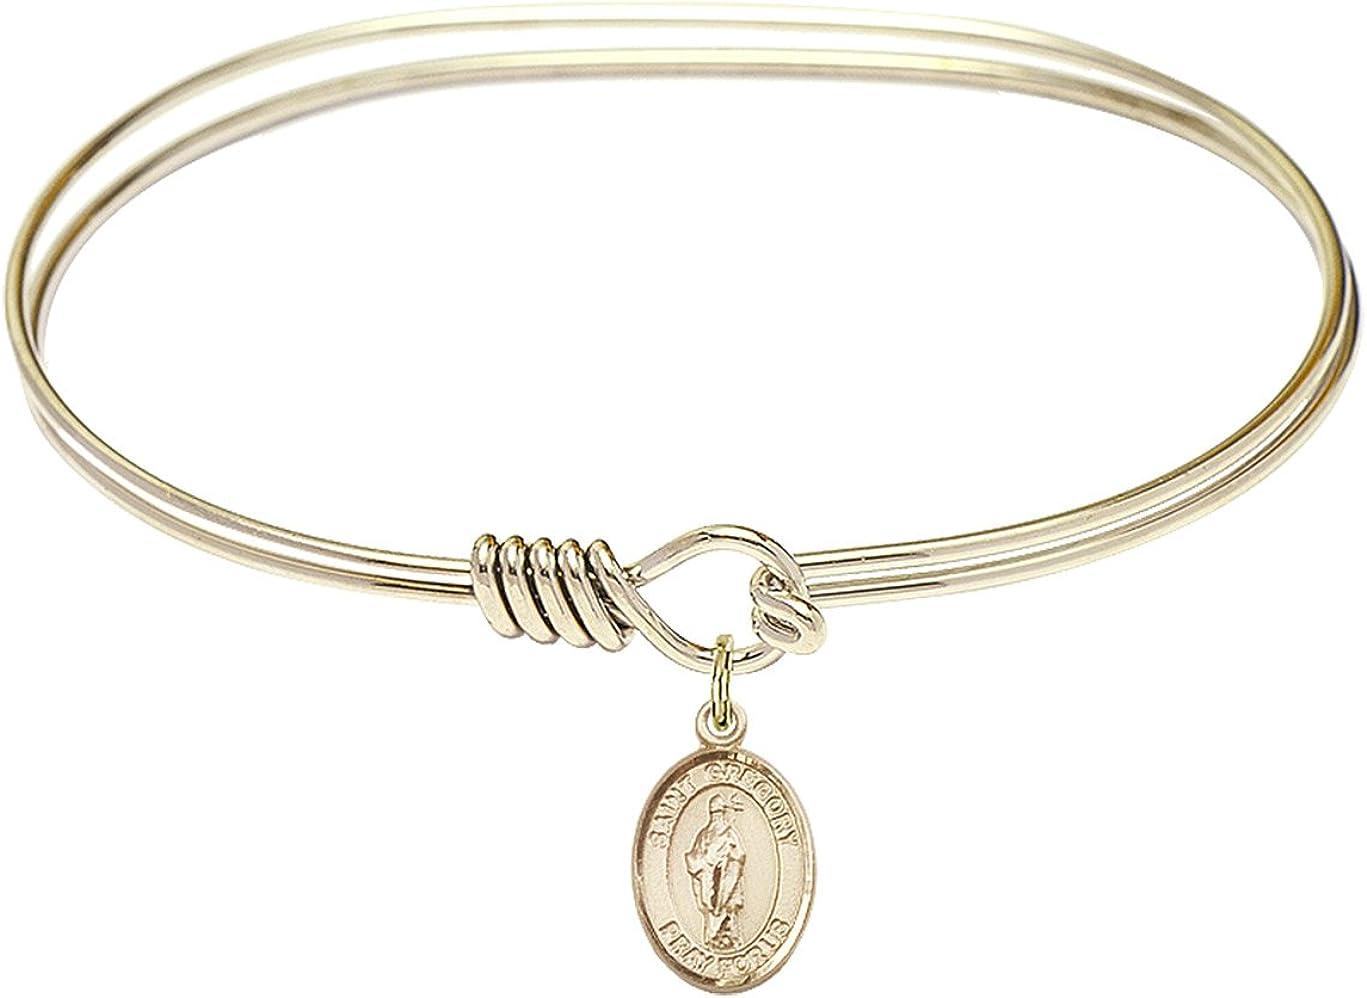 DiamondJewelryNY Eye Hook Bangle Bracelet with a St. Gregory The Great Charm.